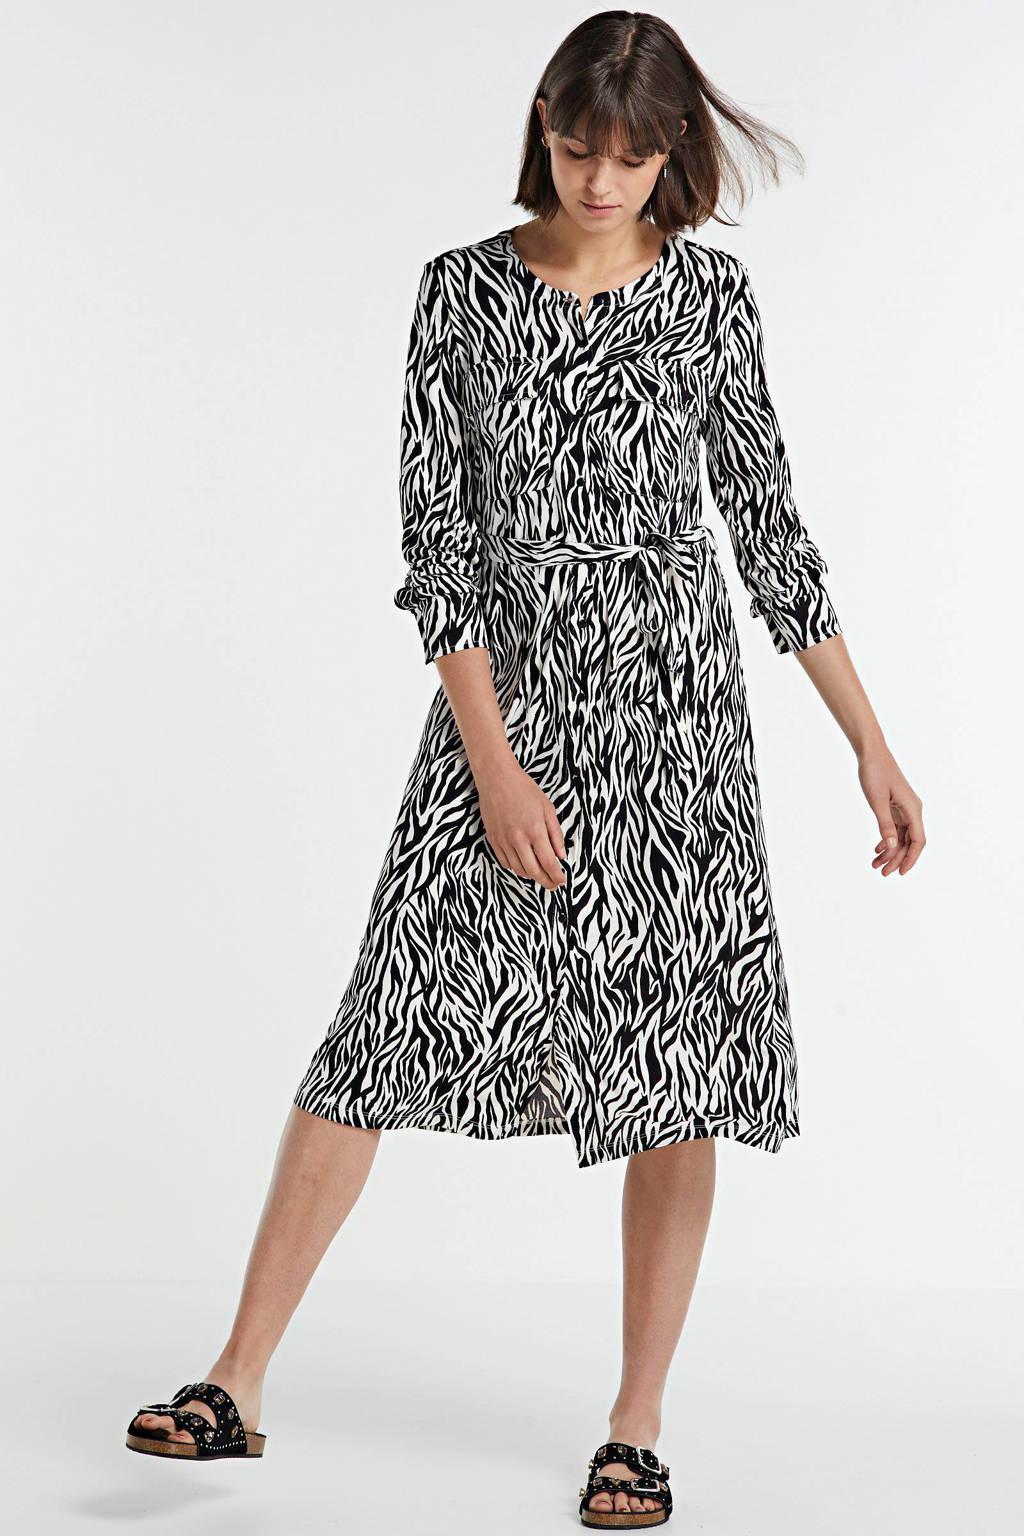 FREEQUENT blousejurk met zebraprint en ceintuur wit/zwart, Wit/zwart